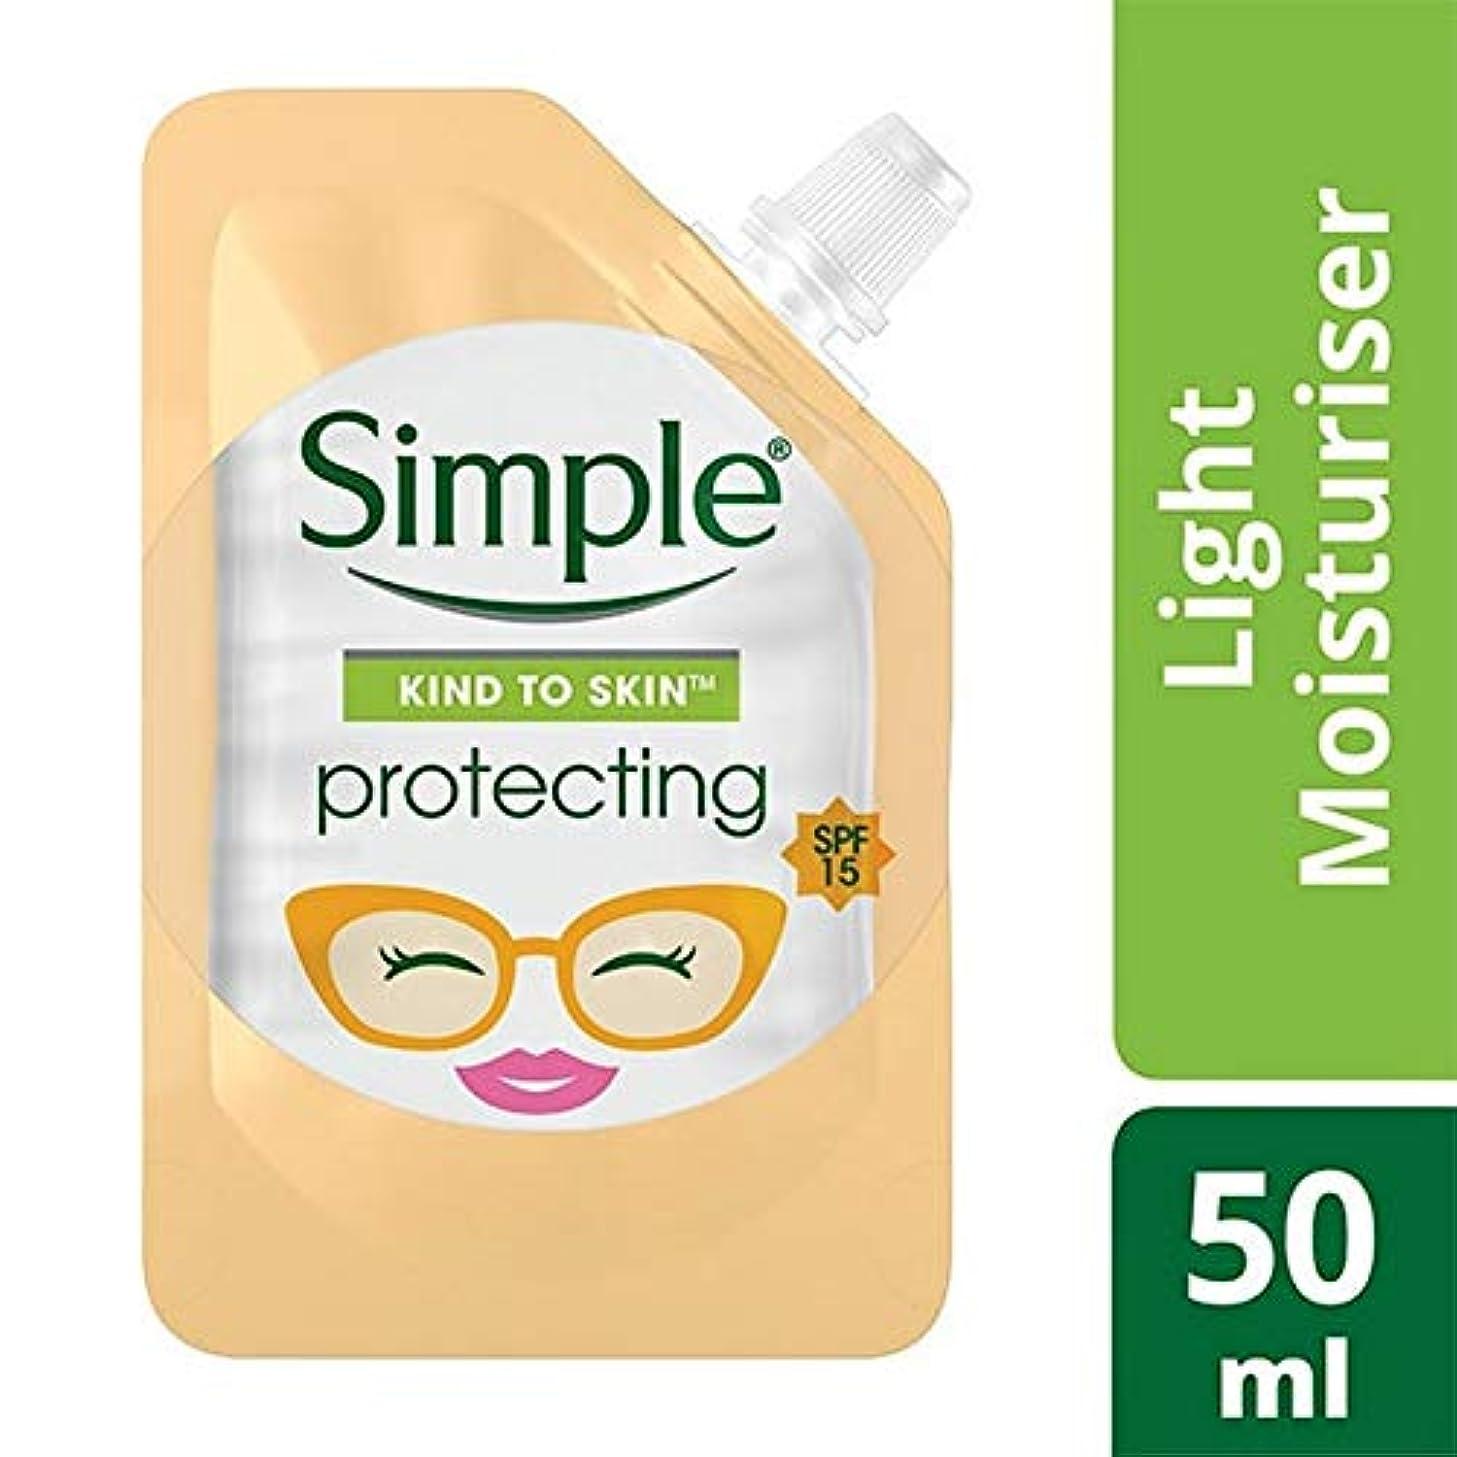 [Simple ] 光保湿50ミリリットルを保護するシンプルなミニポーチ - Simple Mini Pouch Protecting Light Moisturiser 50ml [並行輸入品]